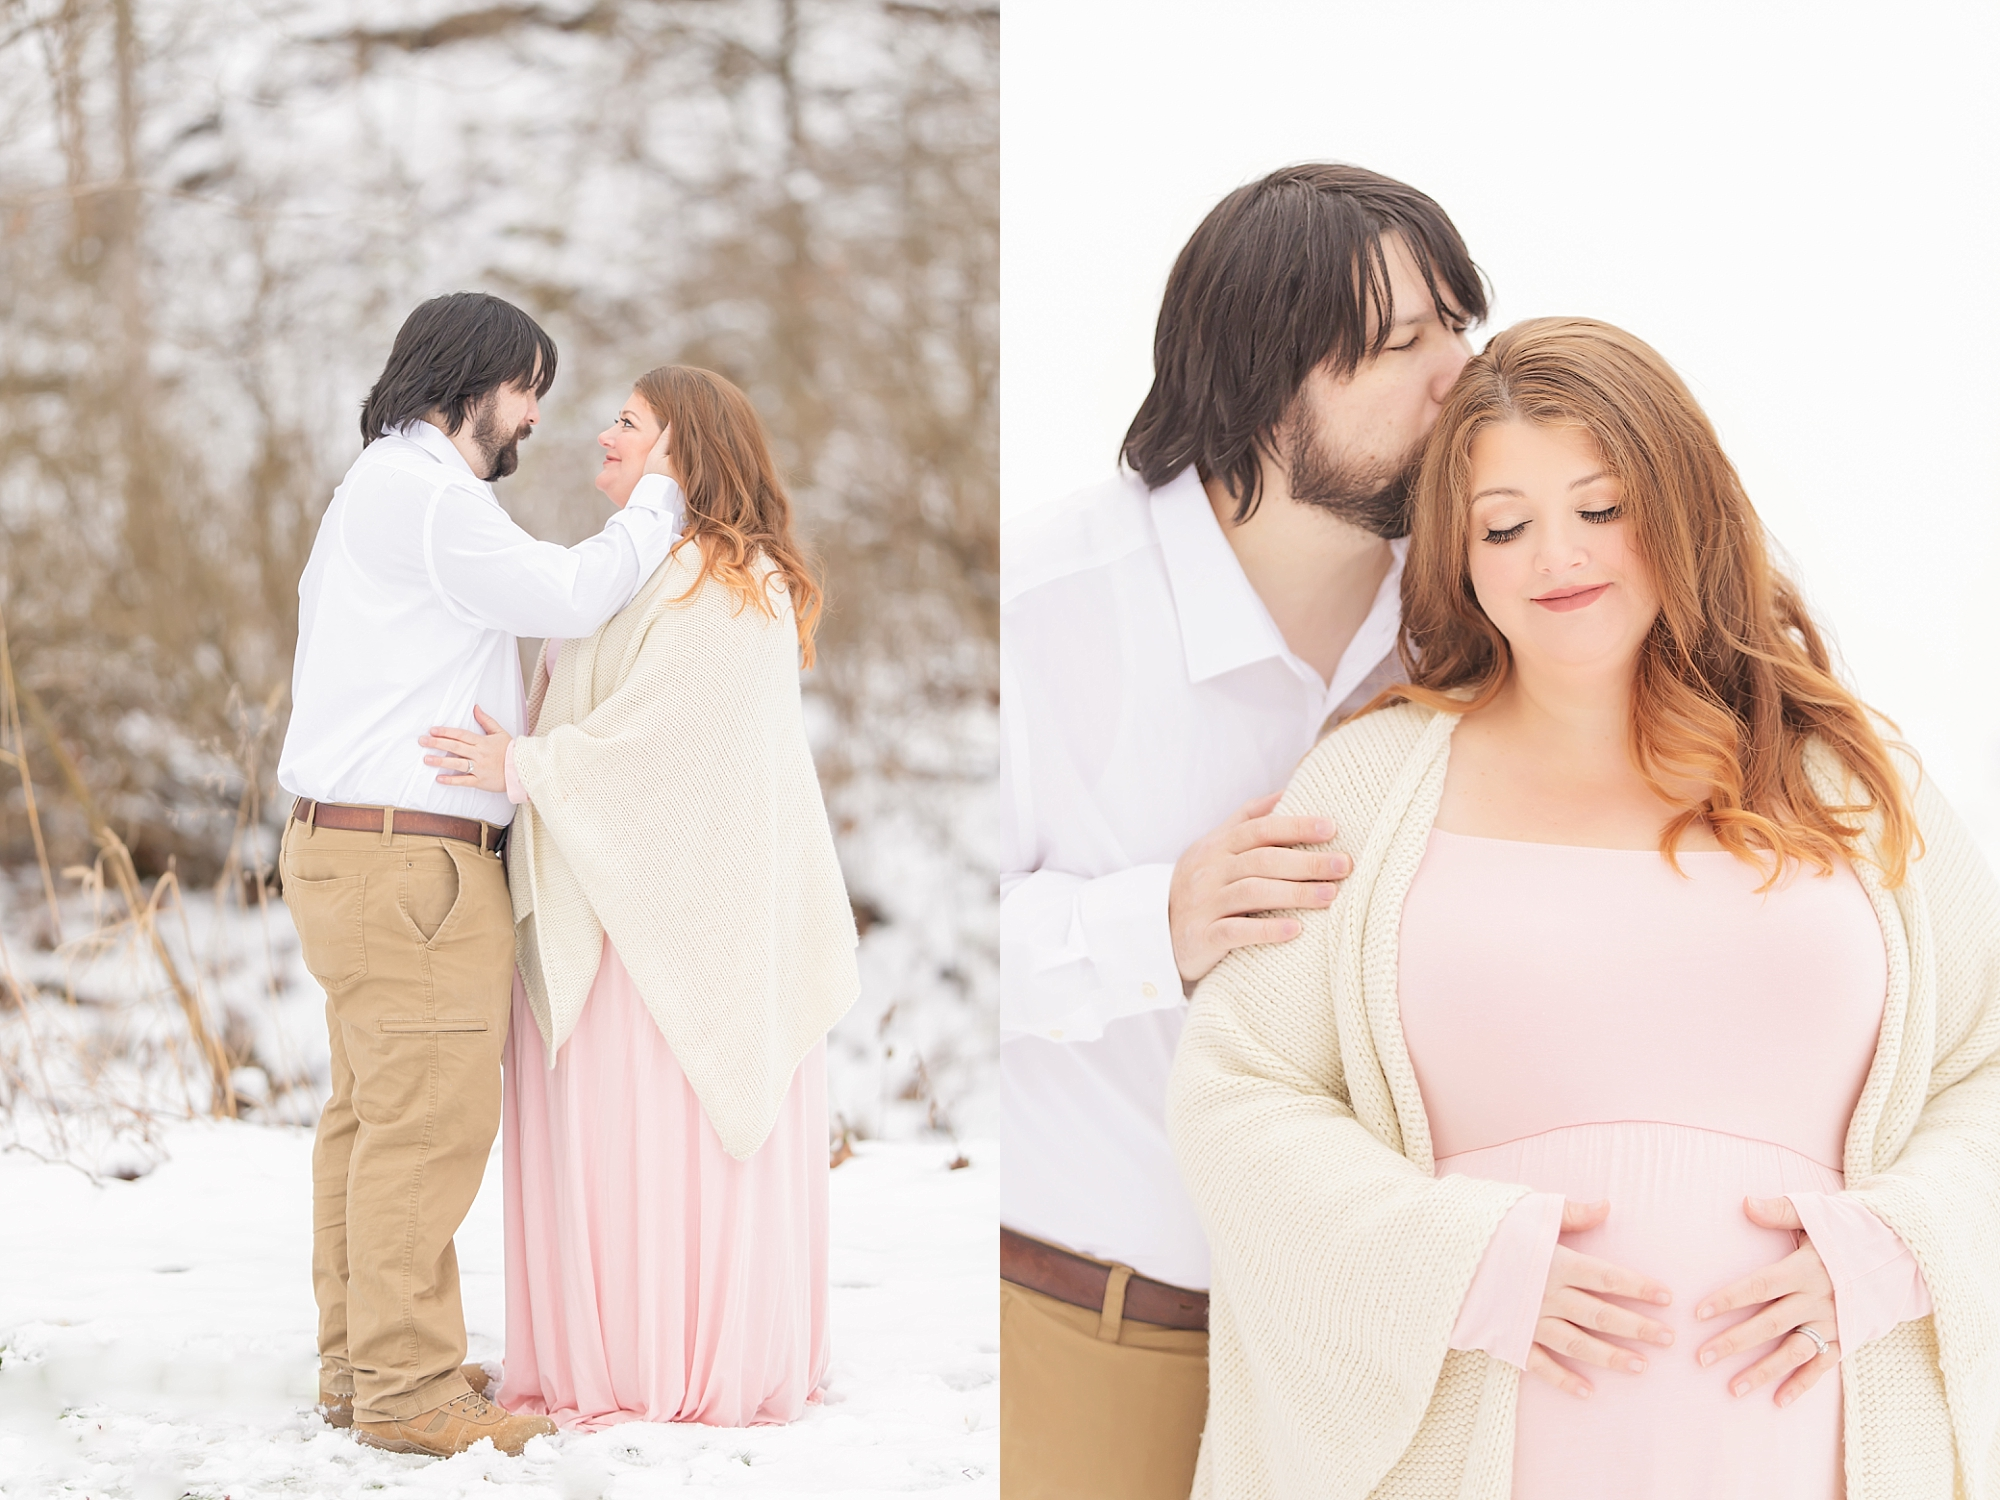 Winter Wonderland maternity photo shoot